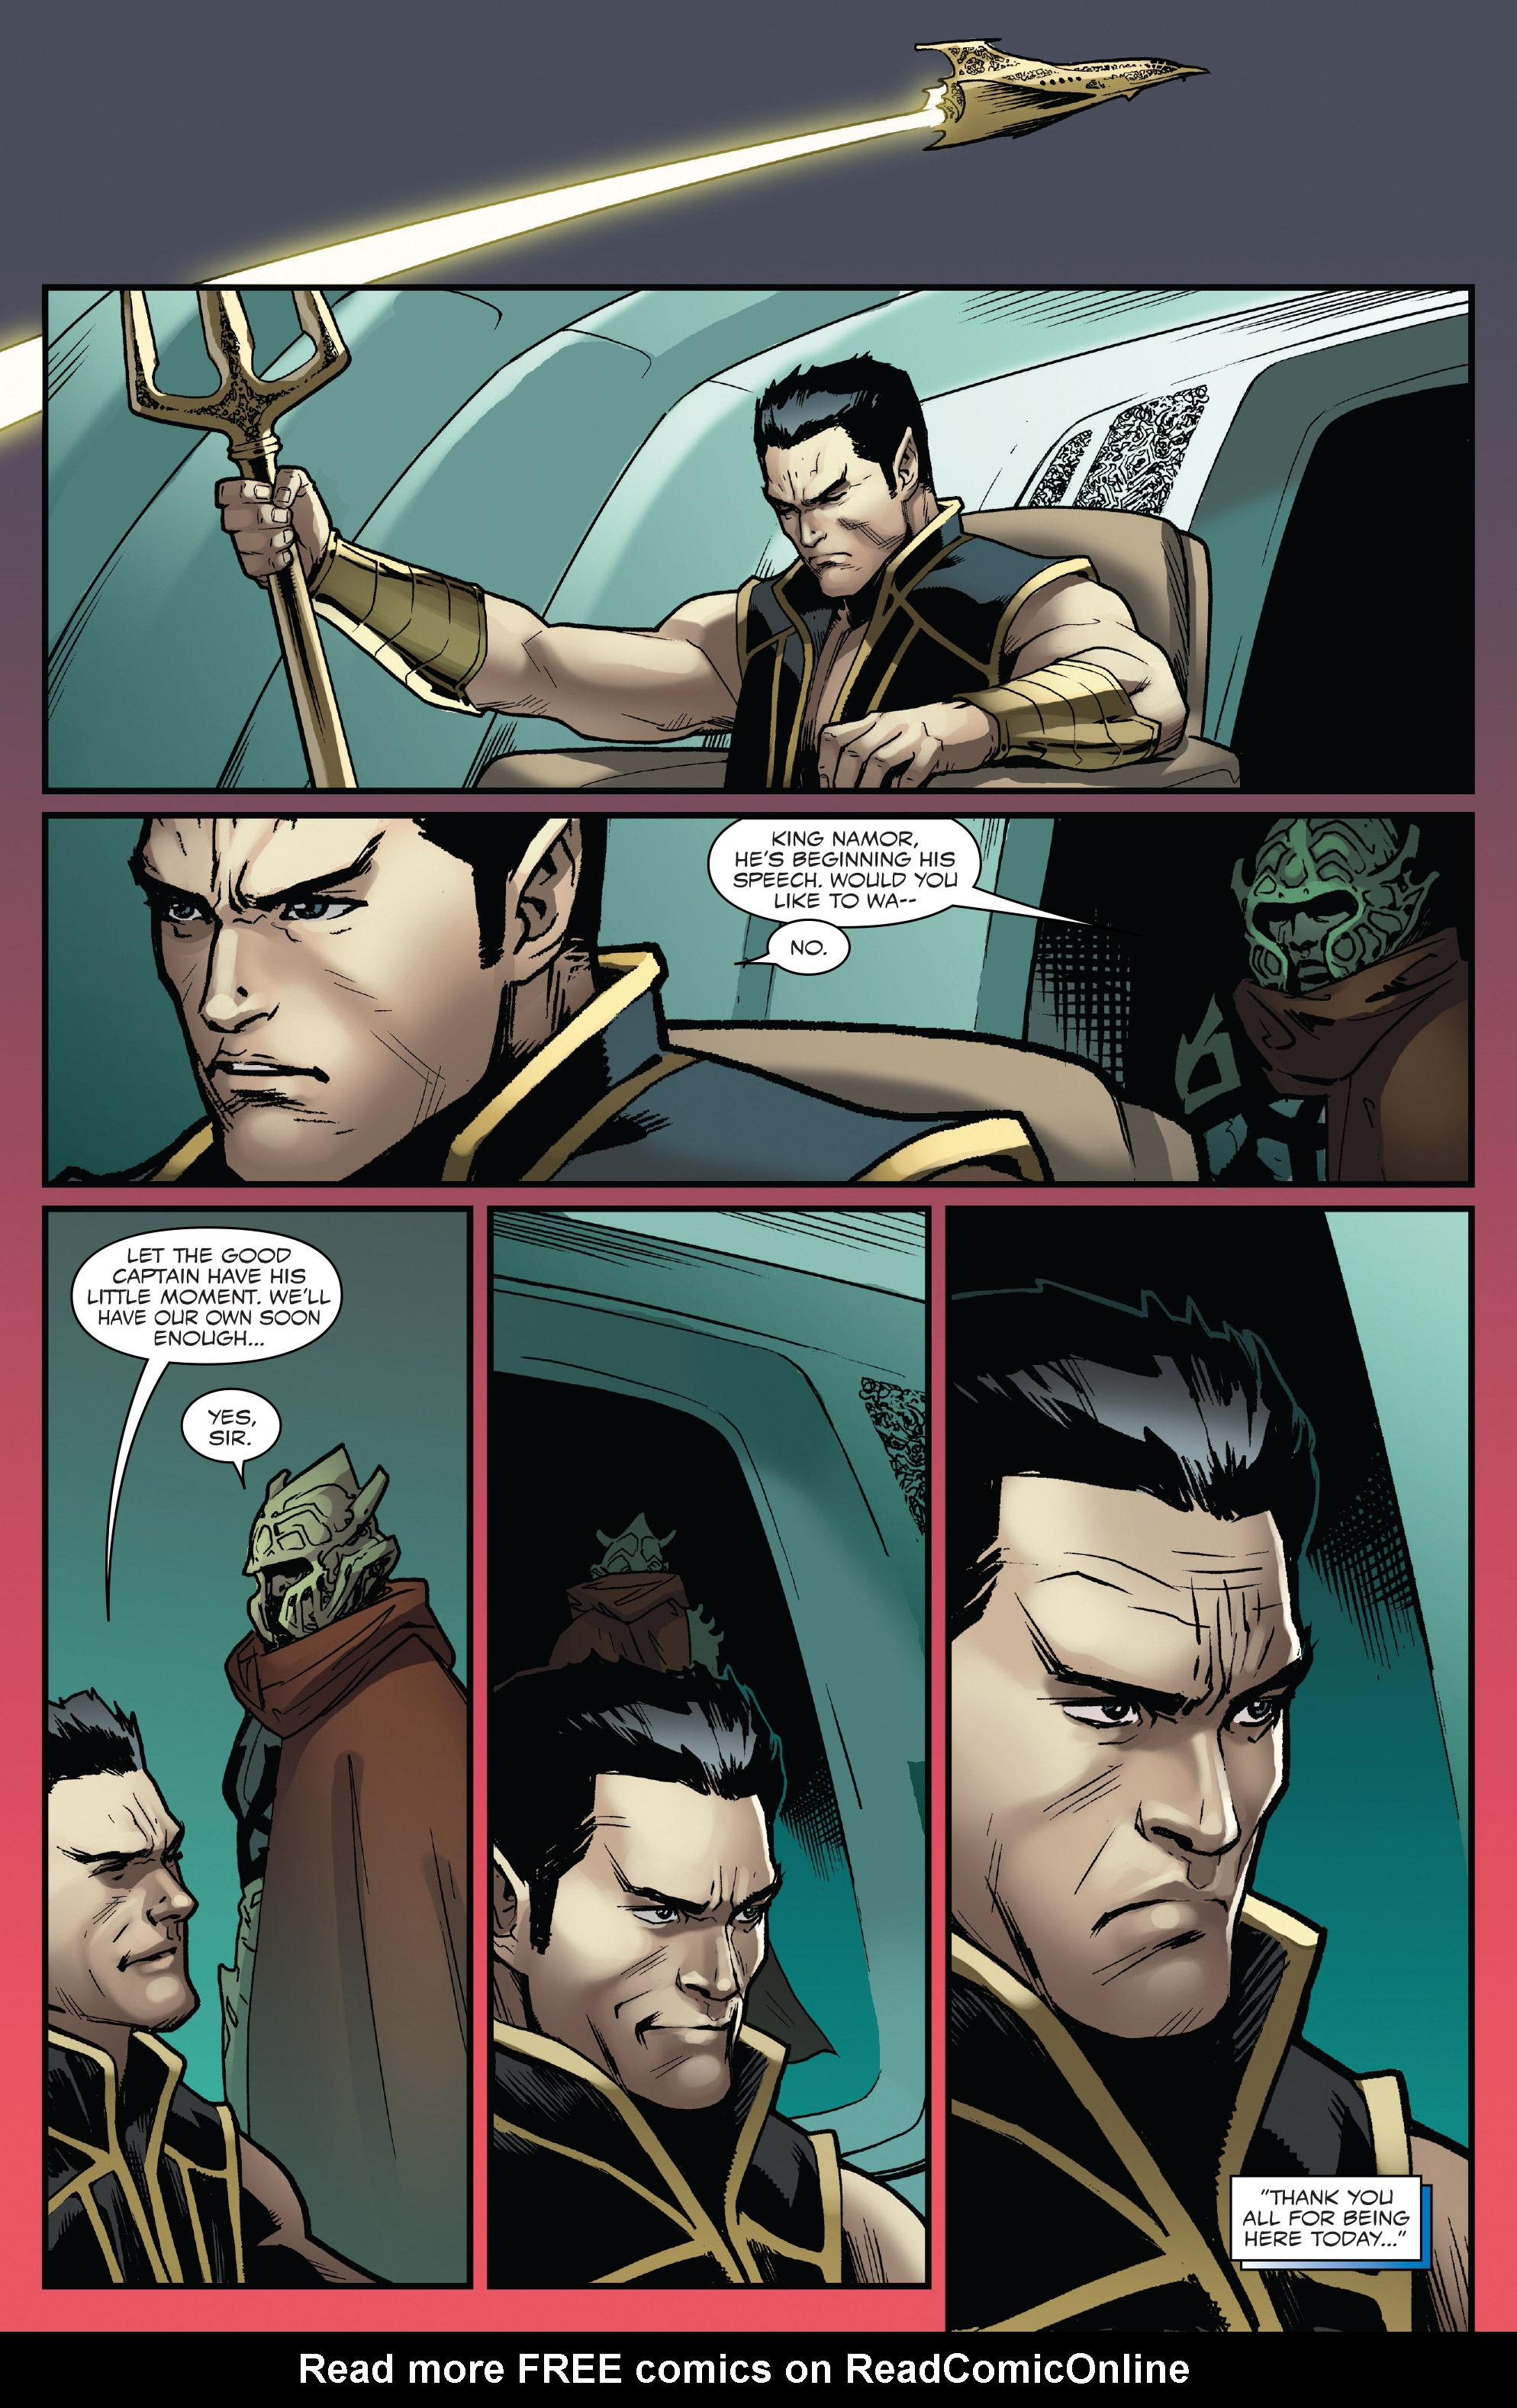 Read online Captain America: Steve Rogers comic -  Issue #18 - 7